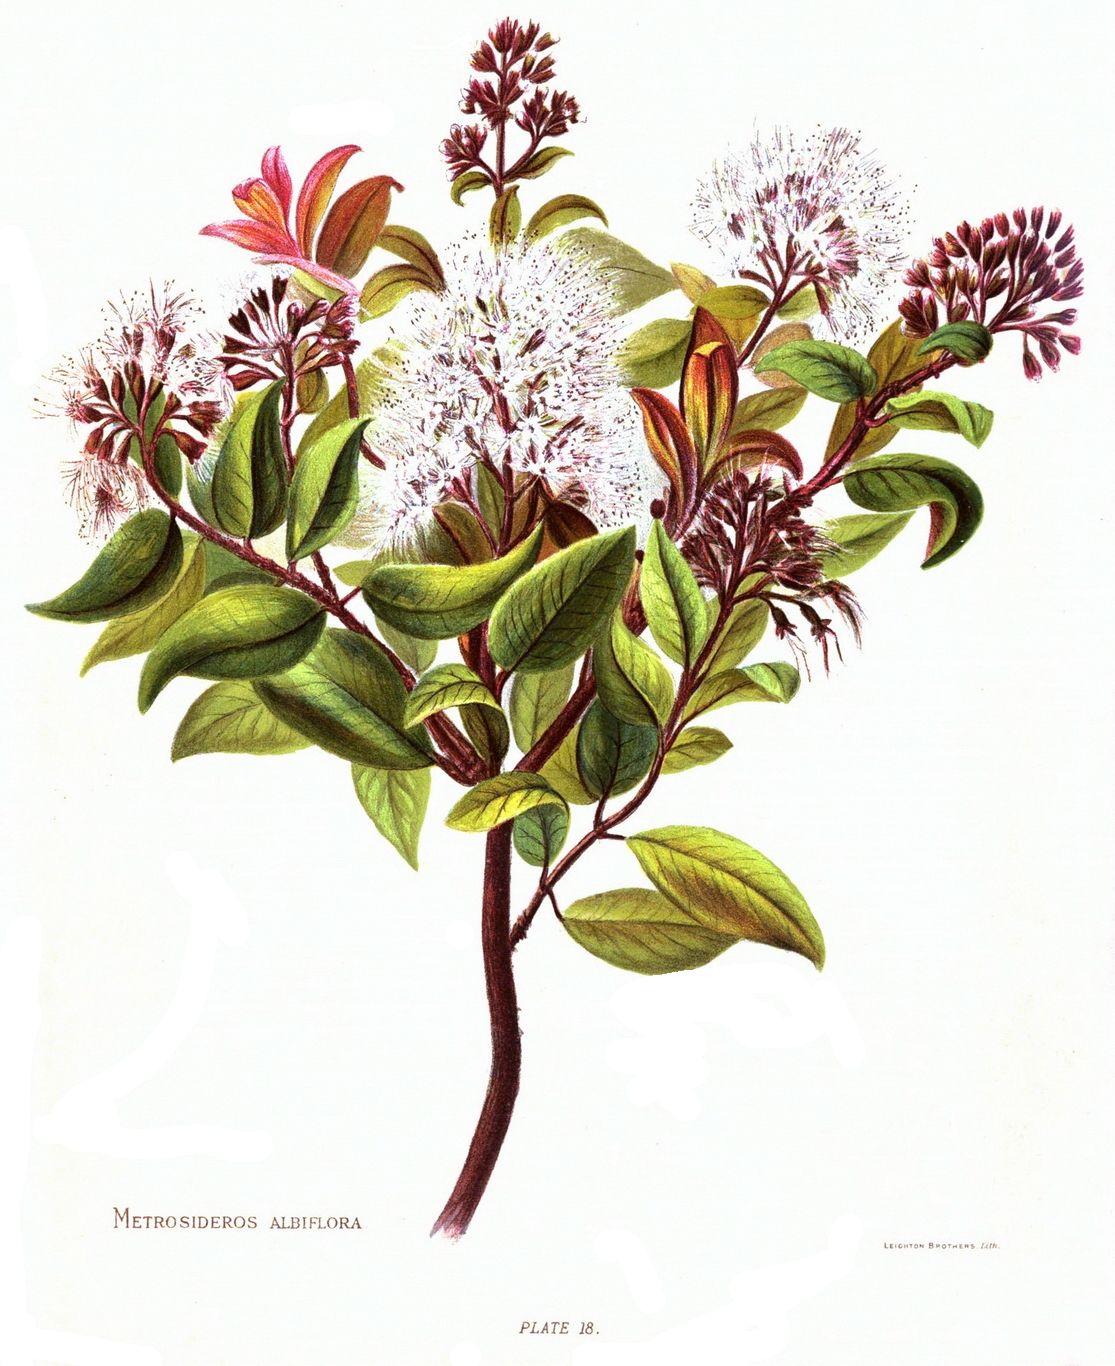 Metrosideros albiflora wikipedia izmirmasajfo